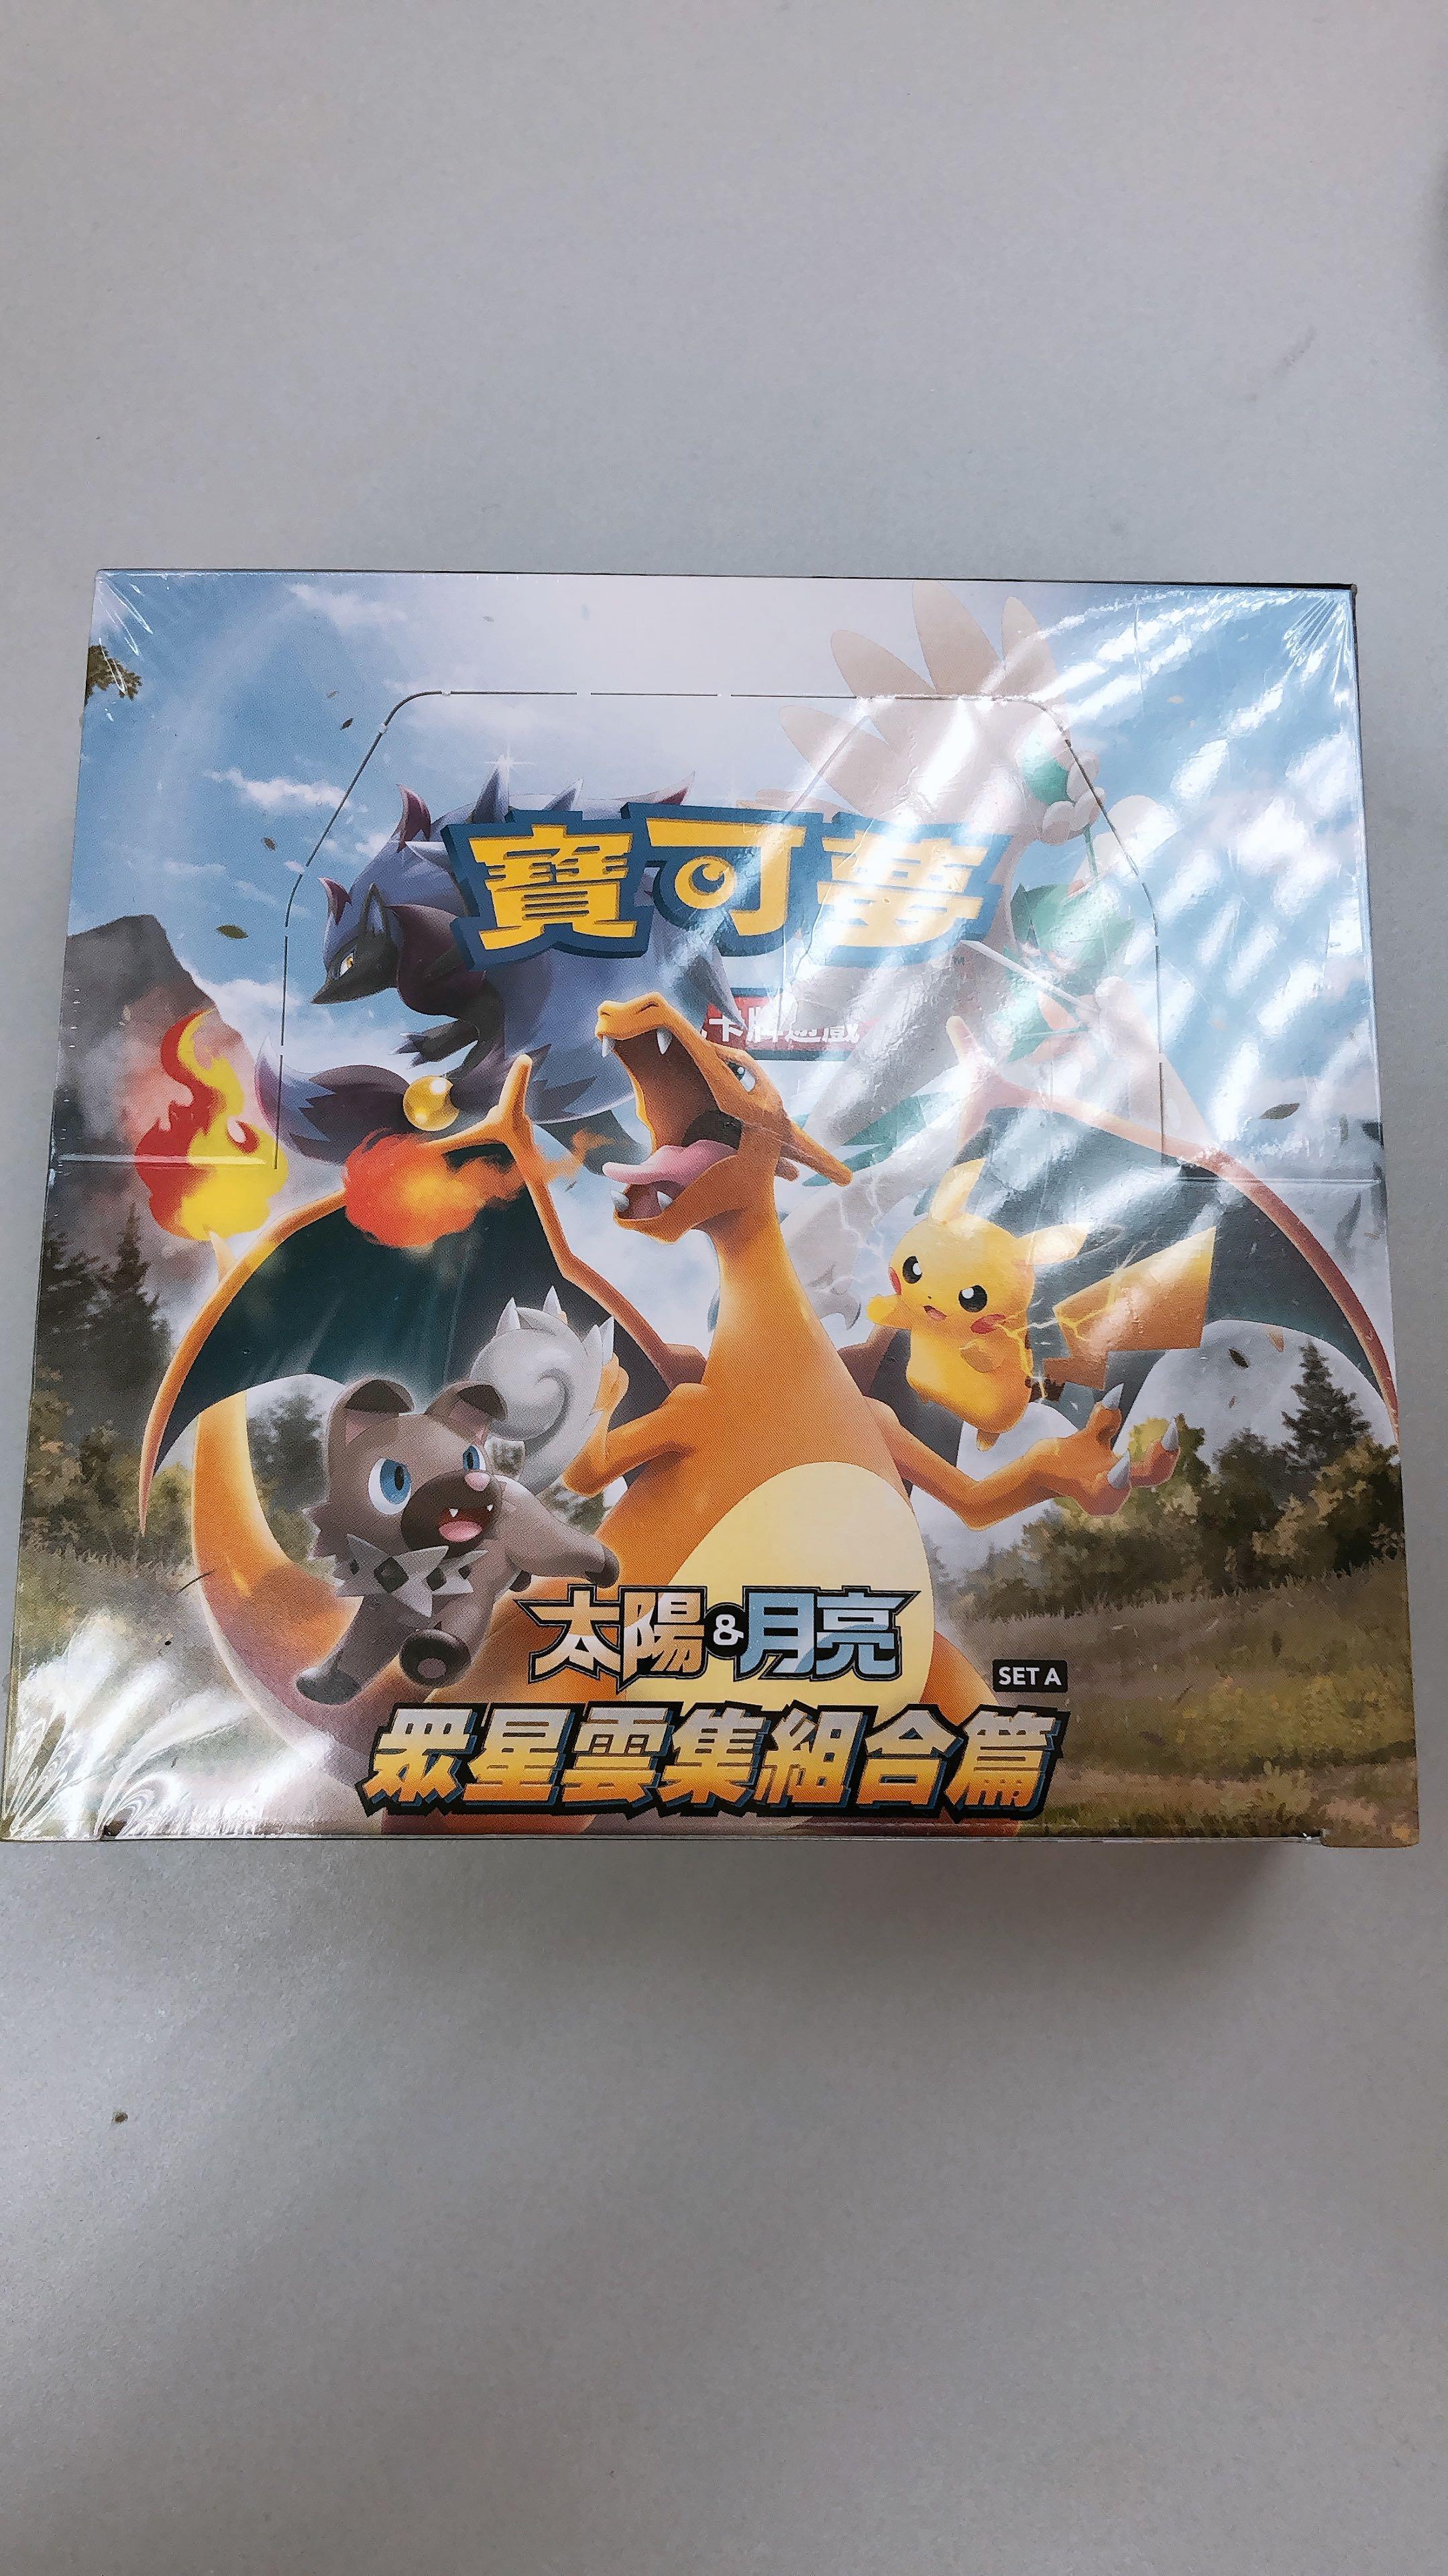 Pokémon card ptcg 寶可夢中文版set A 全新未拆